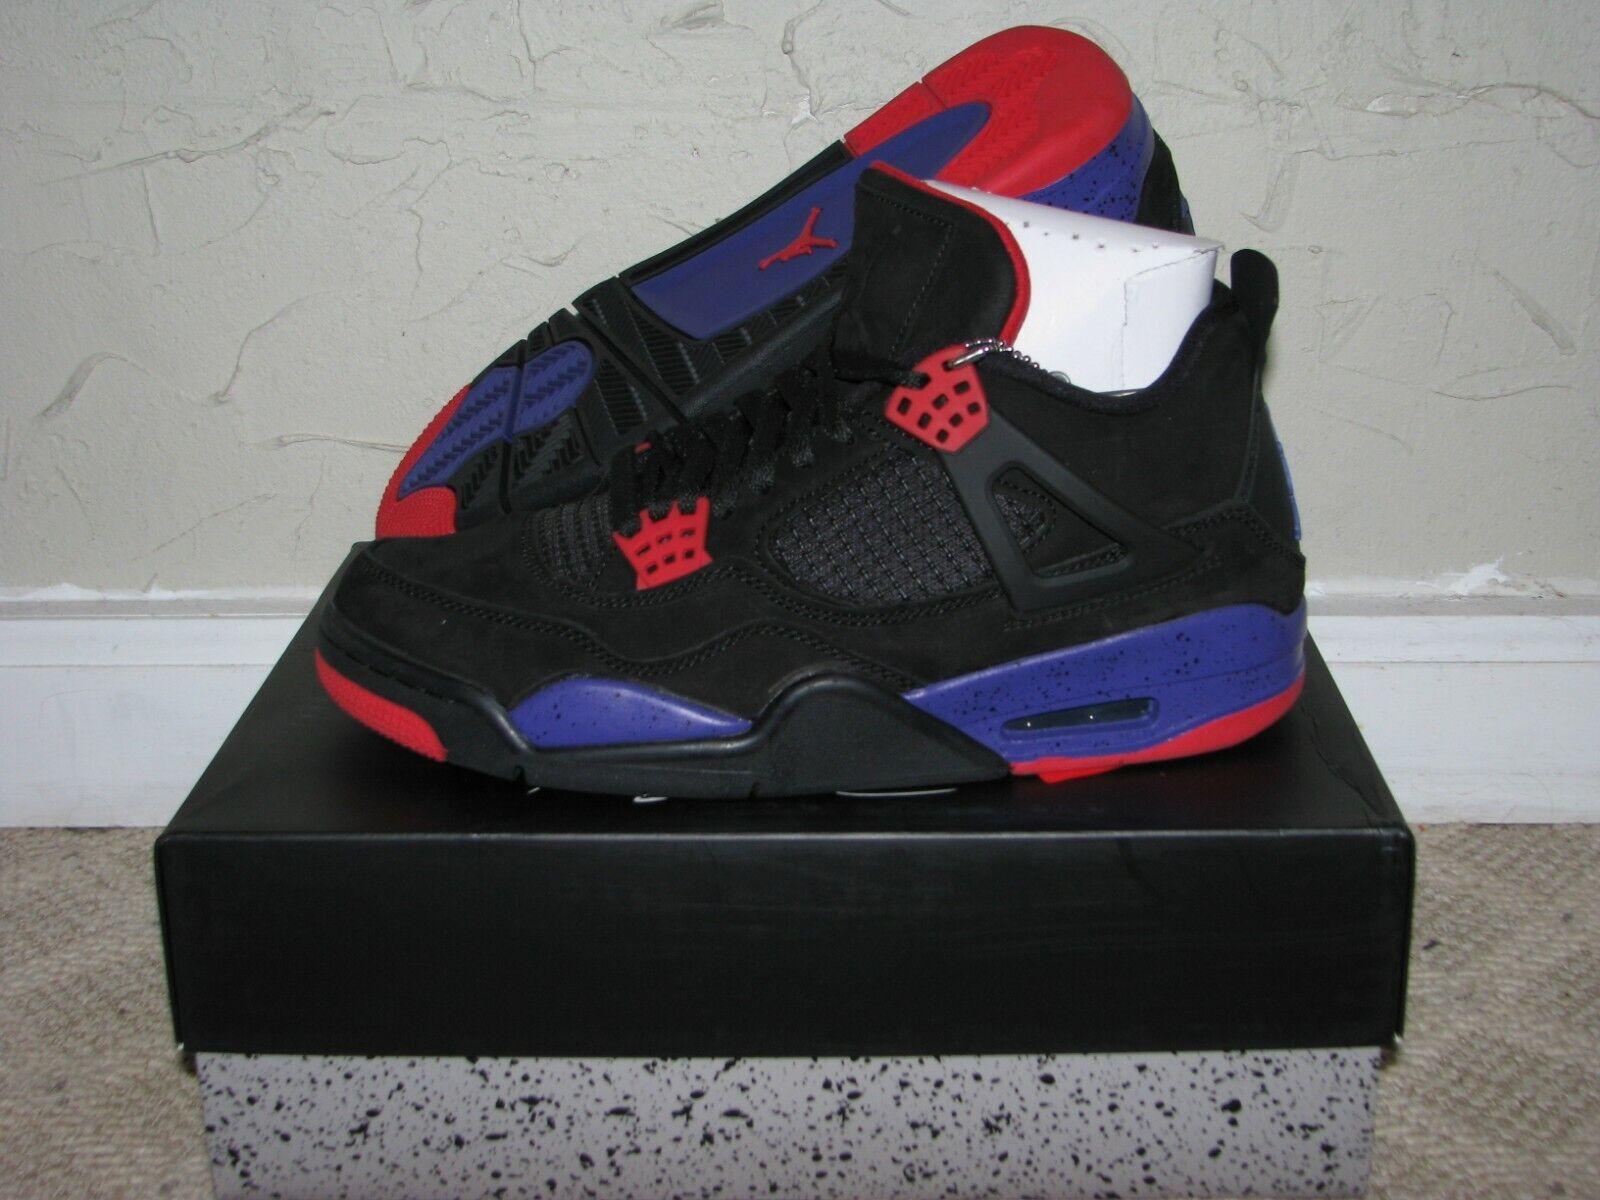 Nike Air Jordan Retro 4 IV NRG Raptors Black Purple AQ3816-065 AUTHENTIC